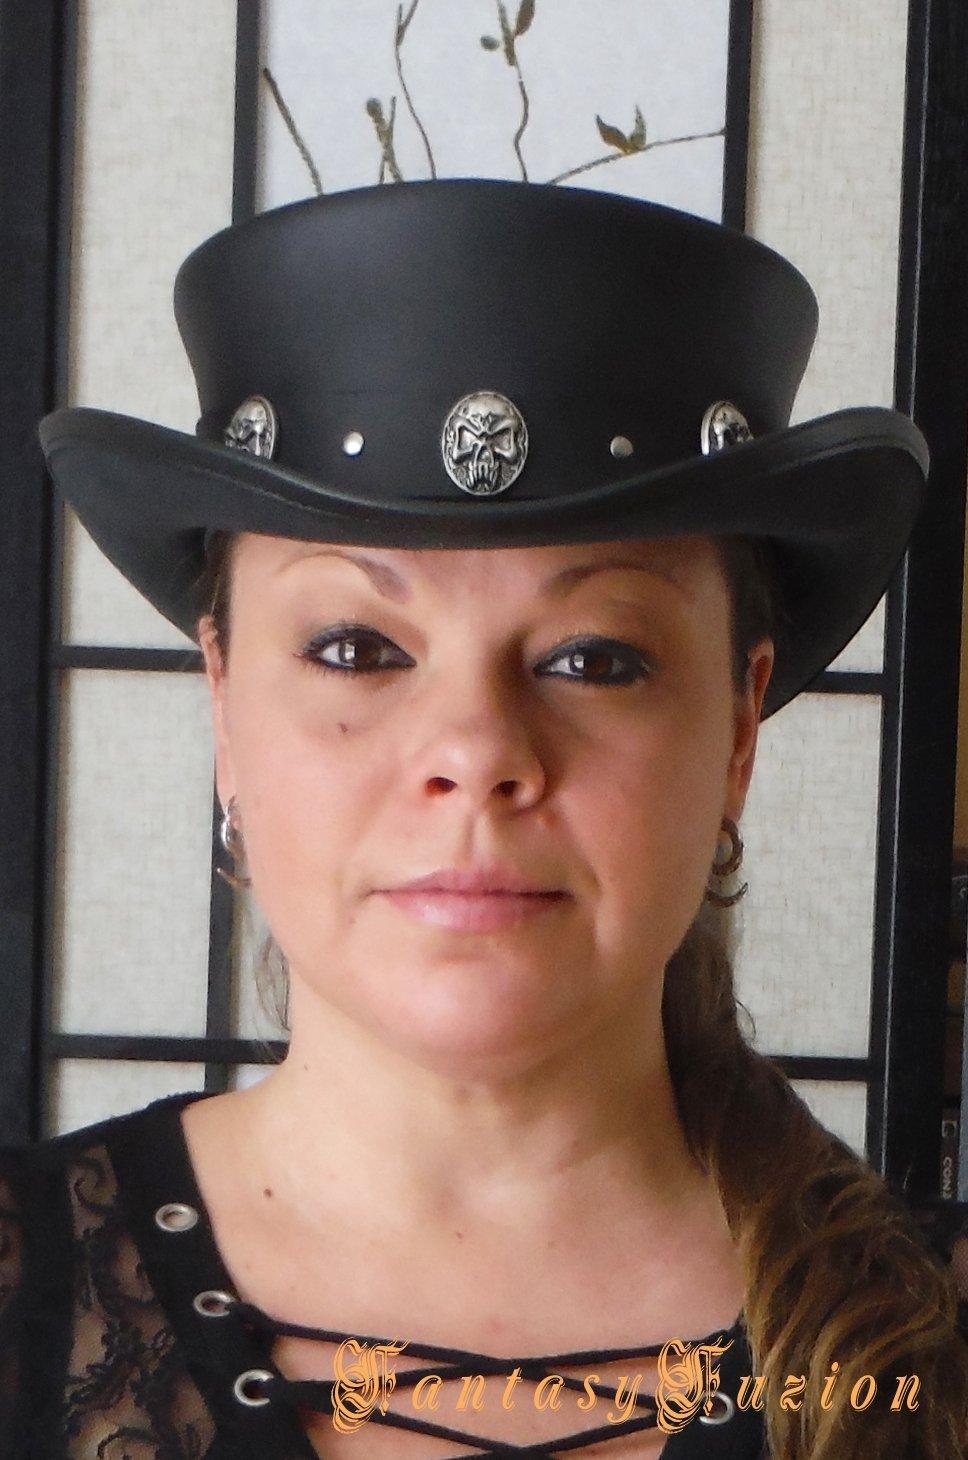 616f9c41d3c Amazon.com  Steampunk Hat Classic Rocker Skull Band Gothic Leather Standard  SHORT Top Hat  Handmade